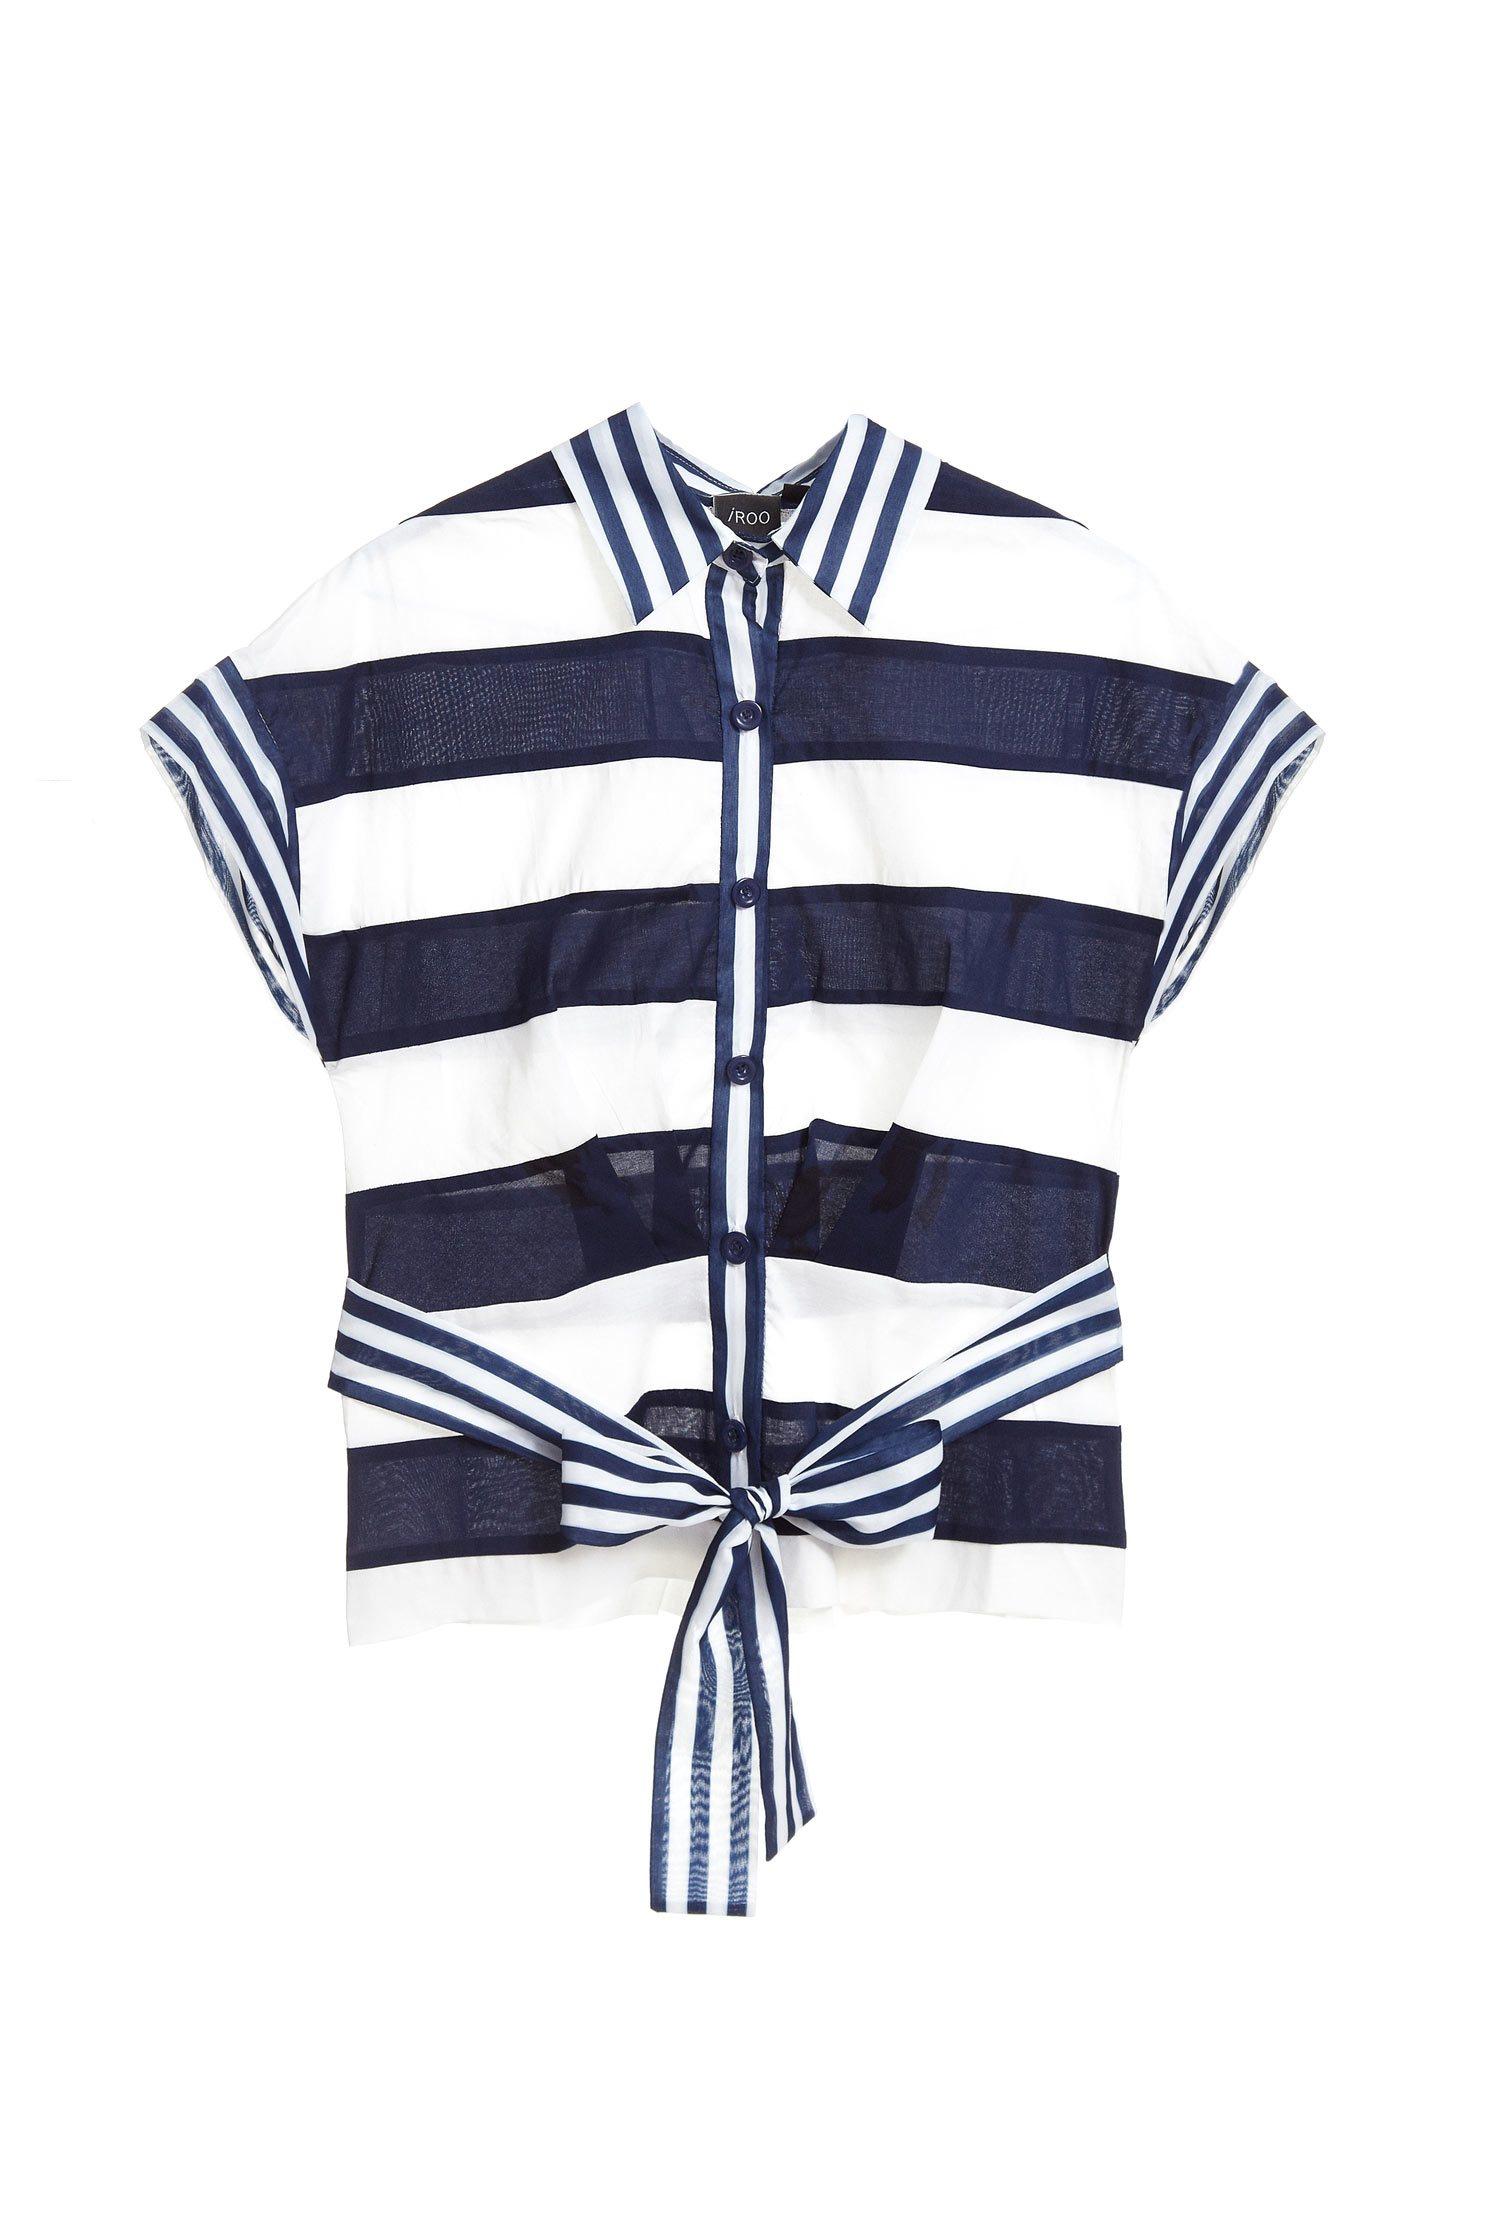 Striped design top